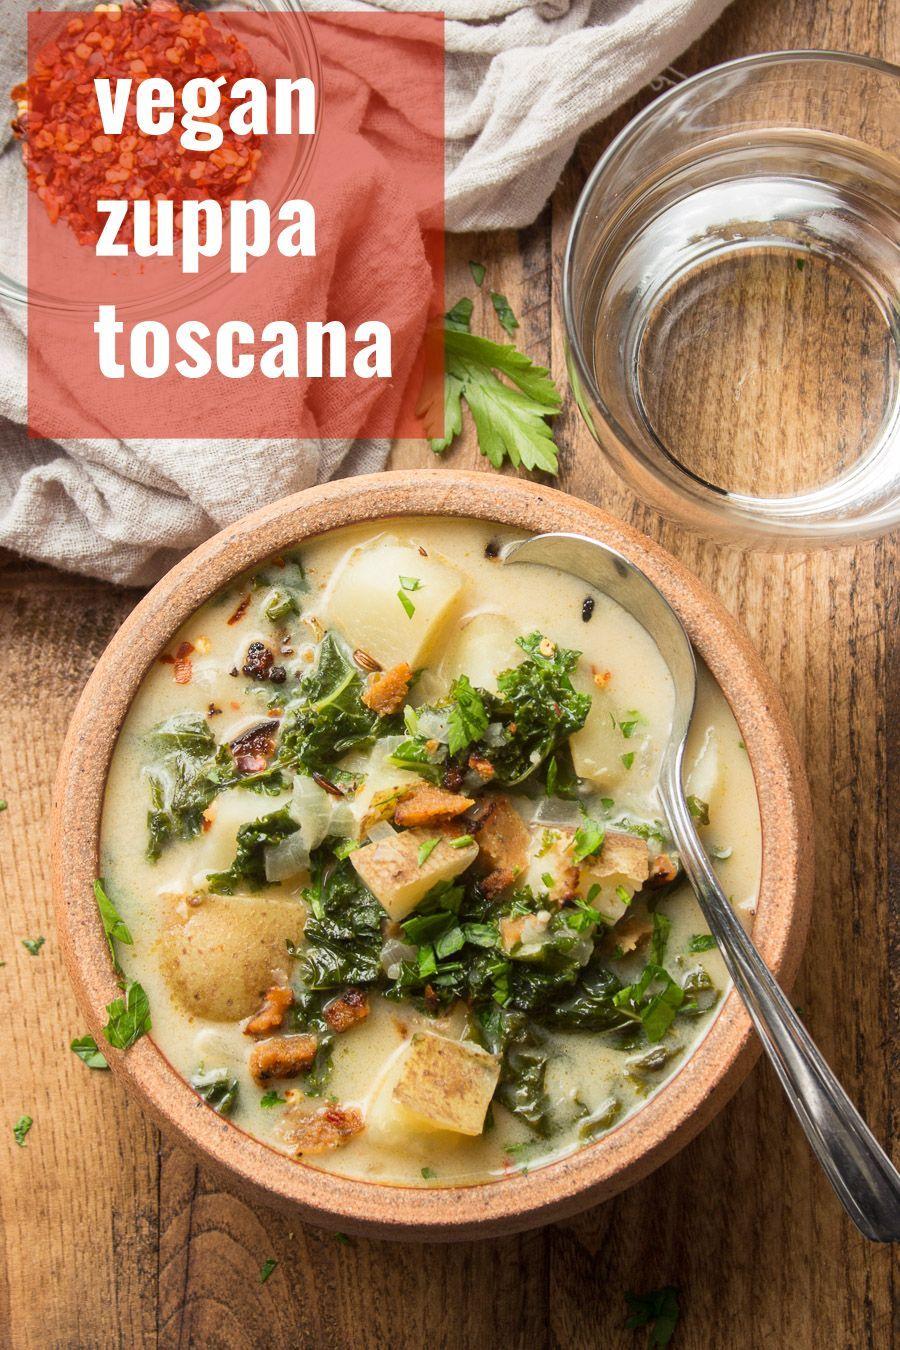 Vegan Zuppa Toscana Vegan Soup Recipes Toscana Recipe Whole Food Recipes